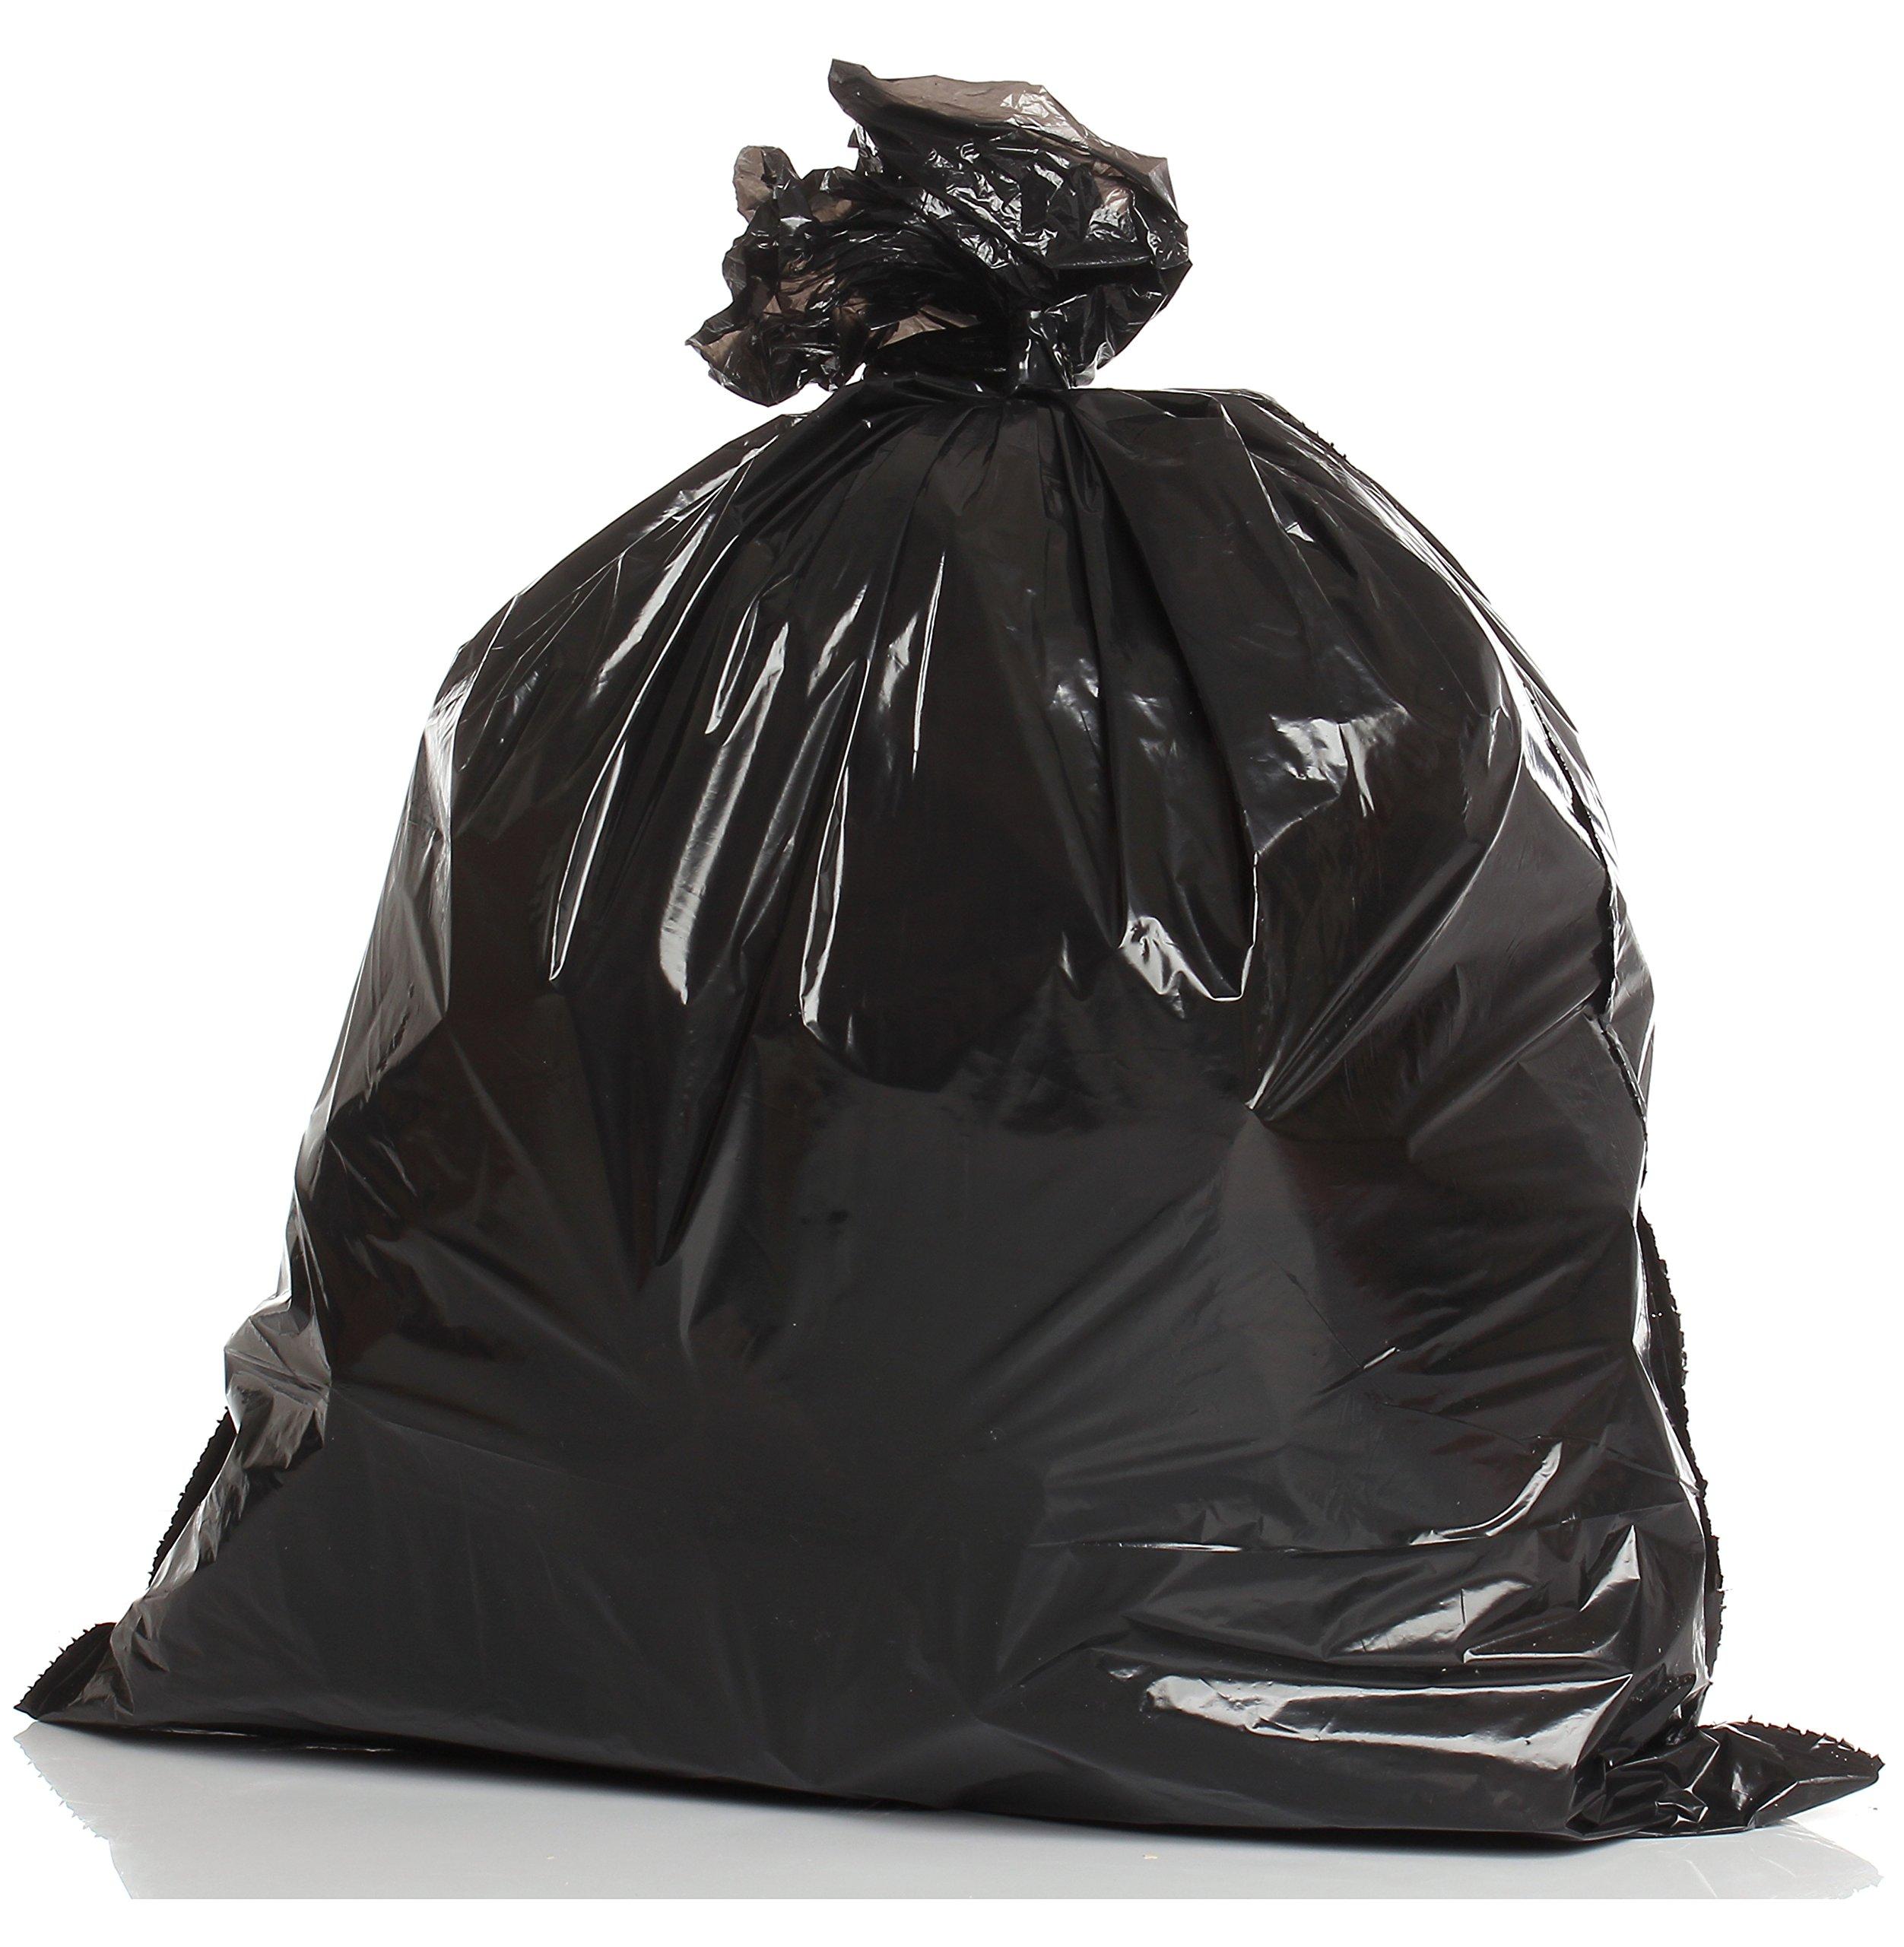 Muscle Bag - Individually Folded 55 Gallon Heavy Duty Trash Bags - 50 per case